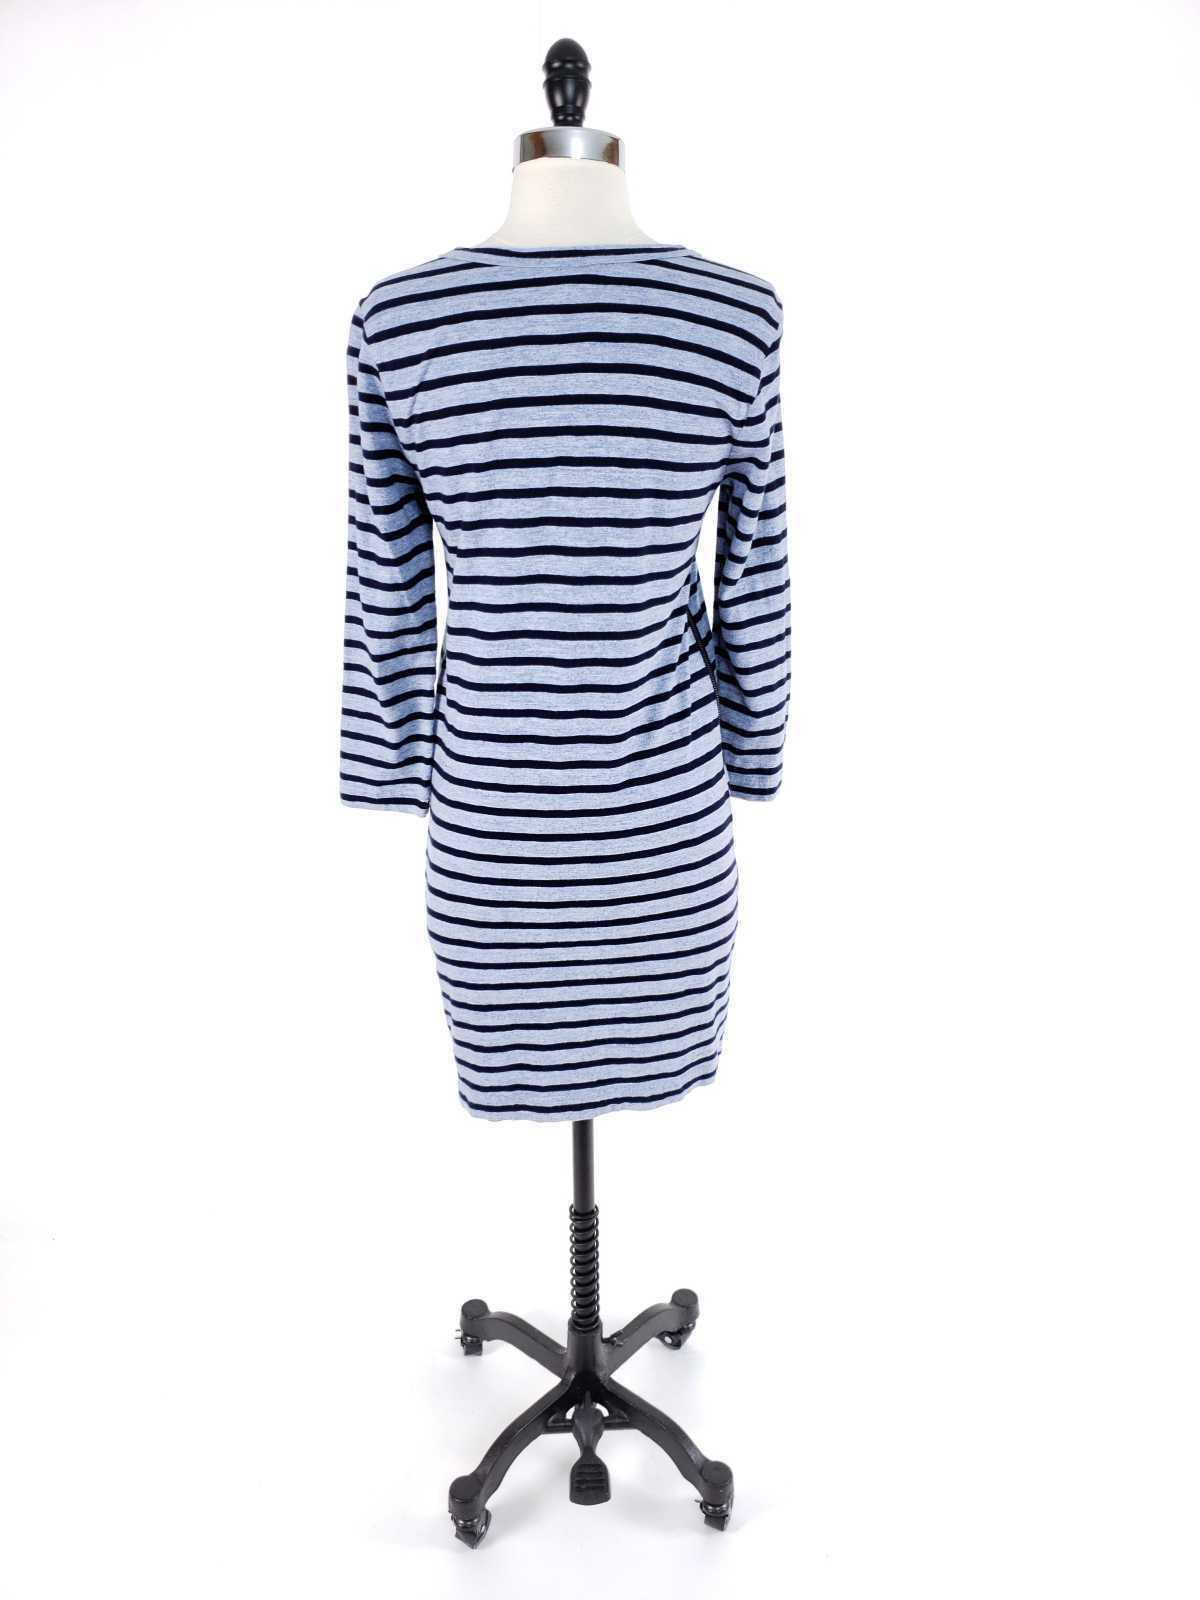 J.Crew Women XS Dress Striped Side Zip Tshirt Cotton Long Sleeve Casual image 4